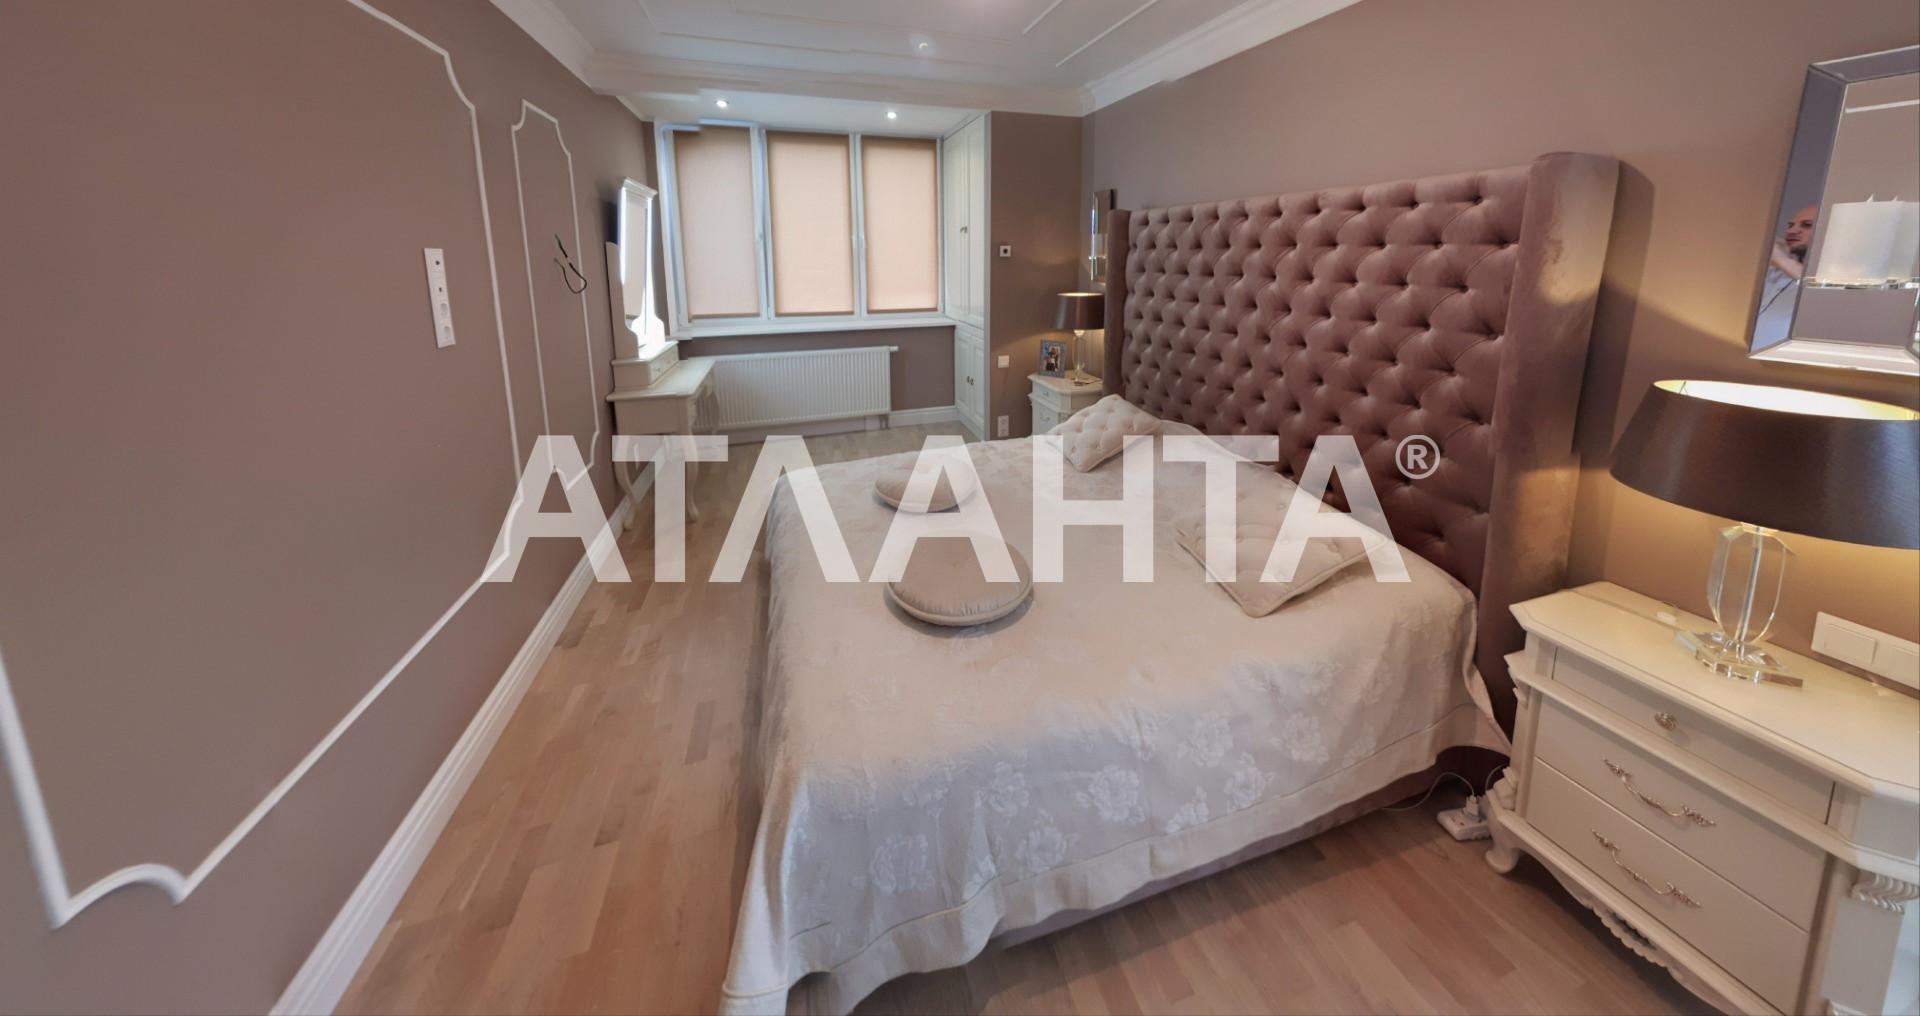 Продается 3-комнатная Квартира на ул. Ул. Ломоносова — 230 000 у.е. (фото №16)